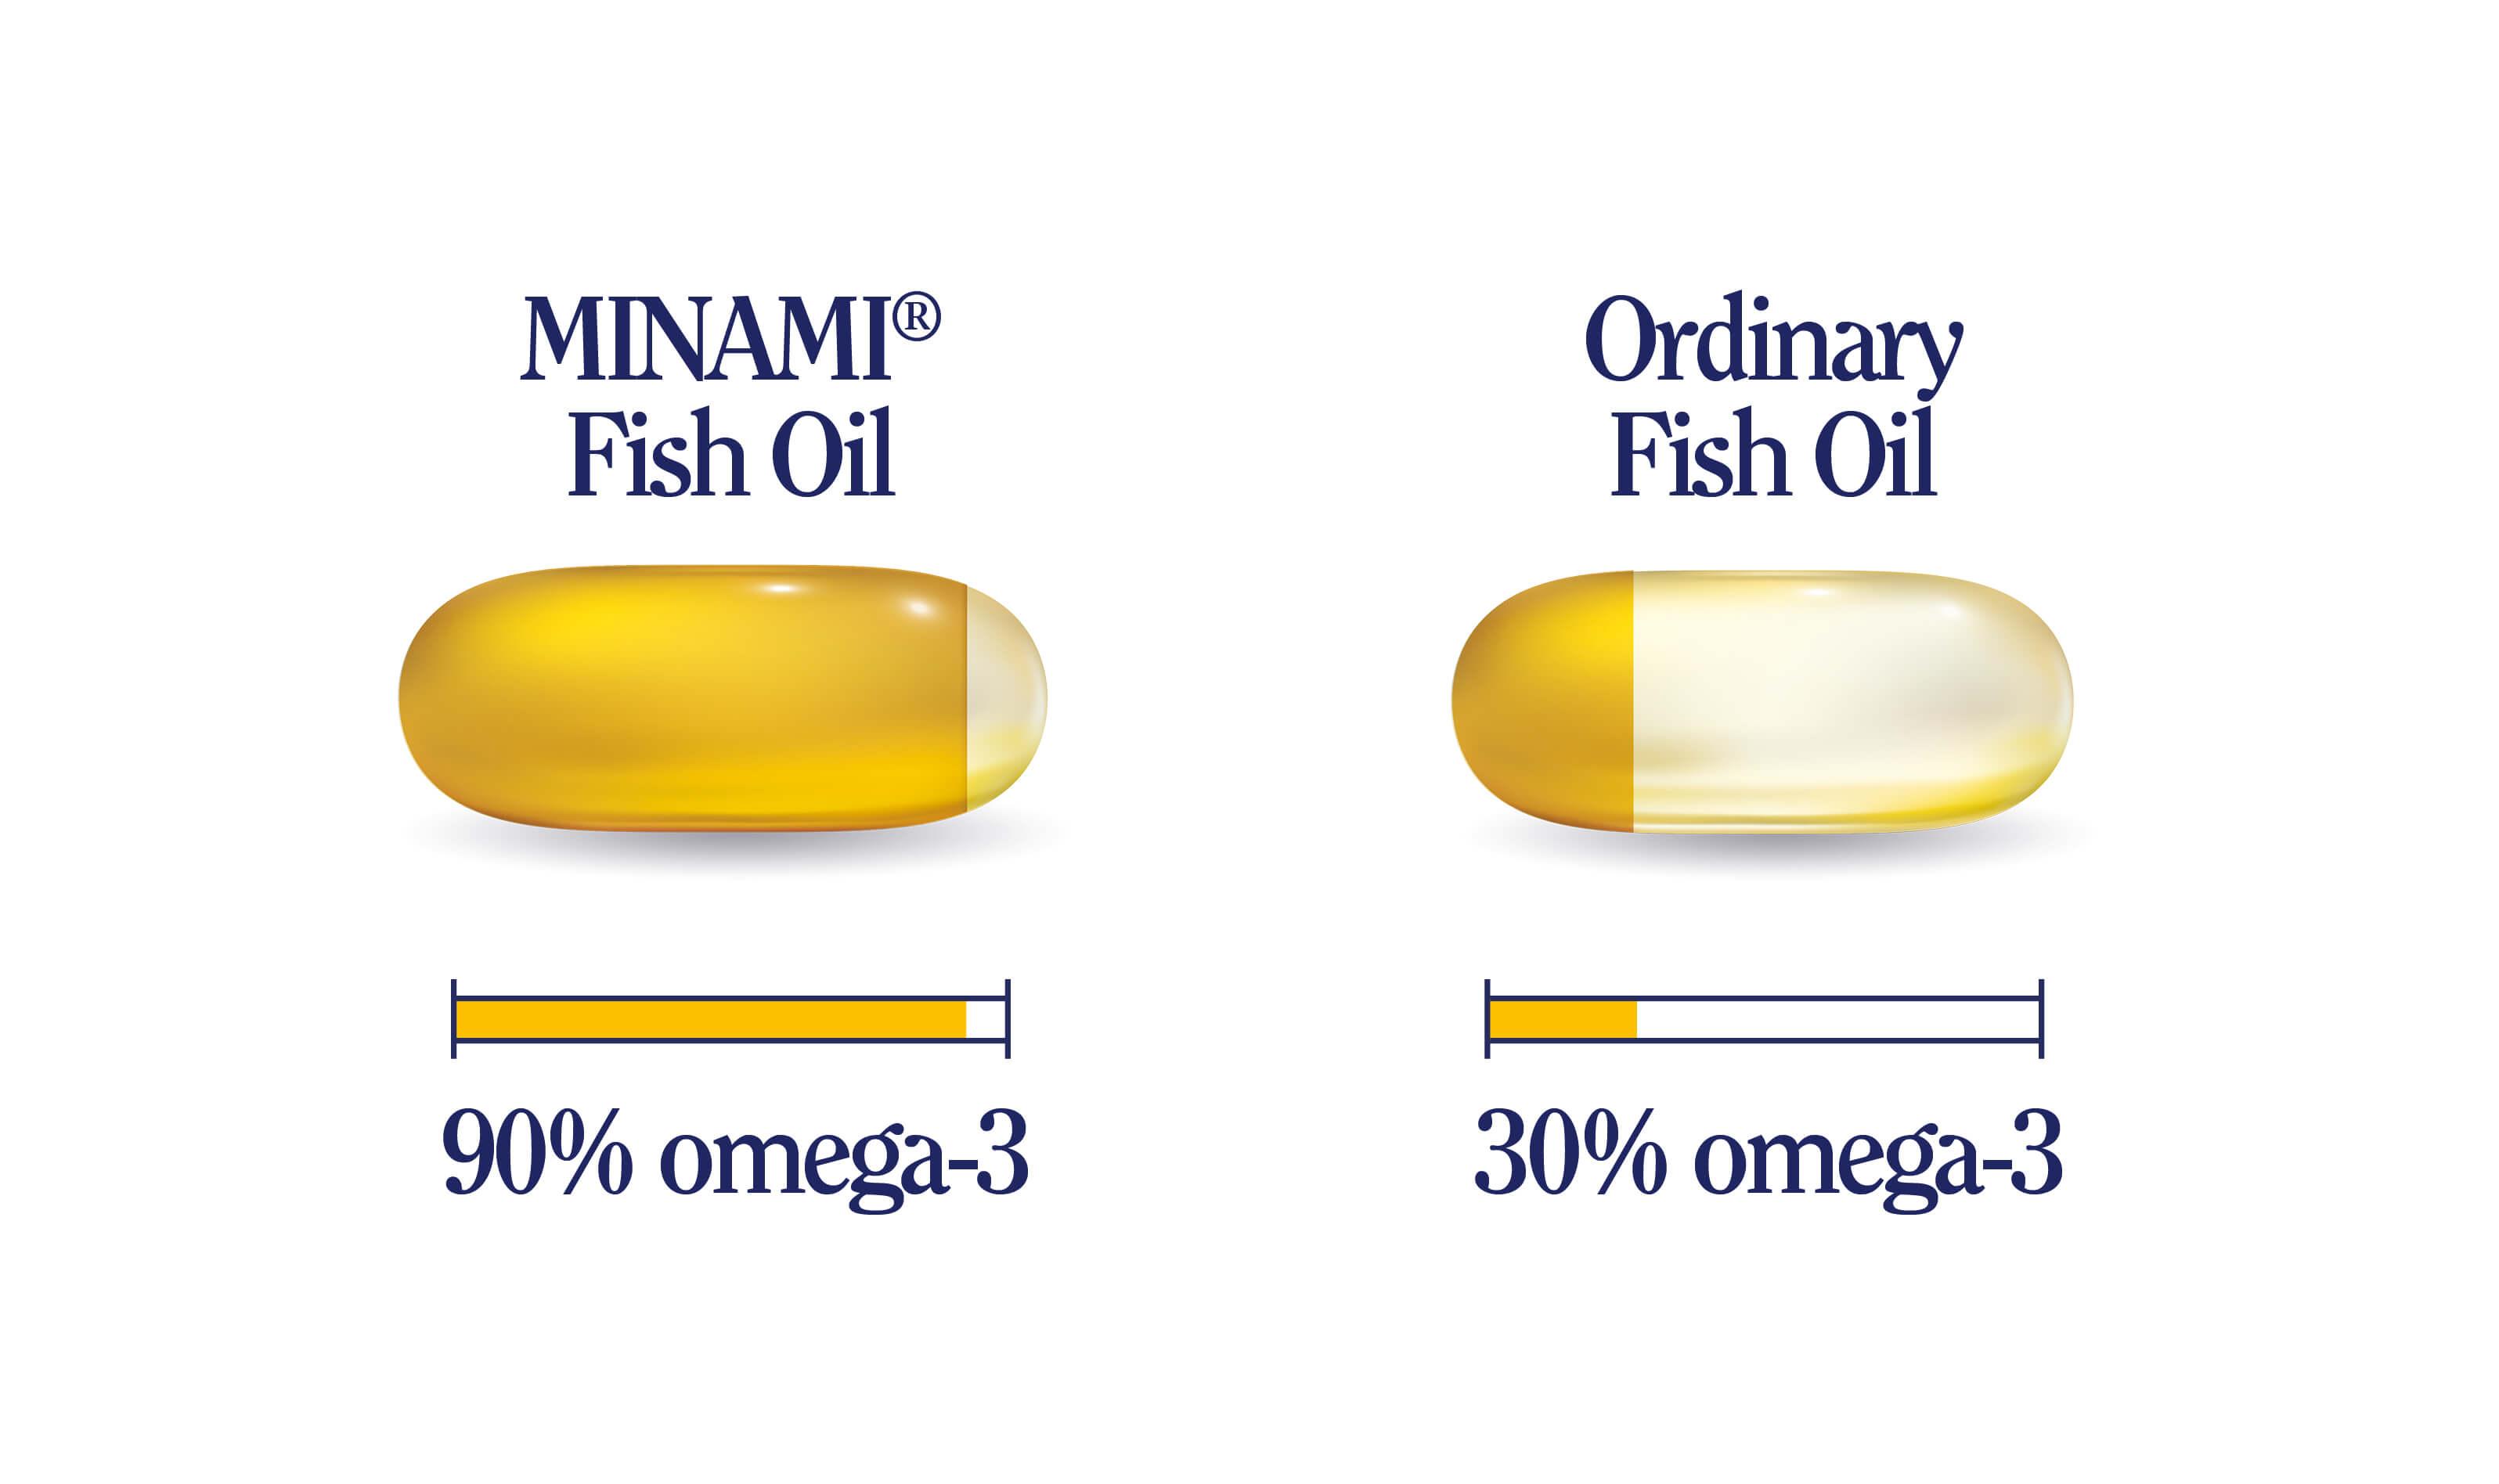 Minami Fish Oil vs Ordinary Fish Oil